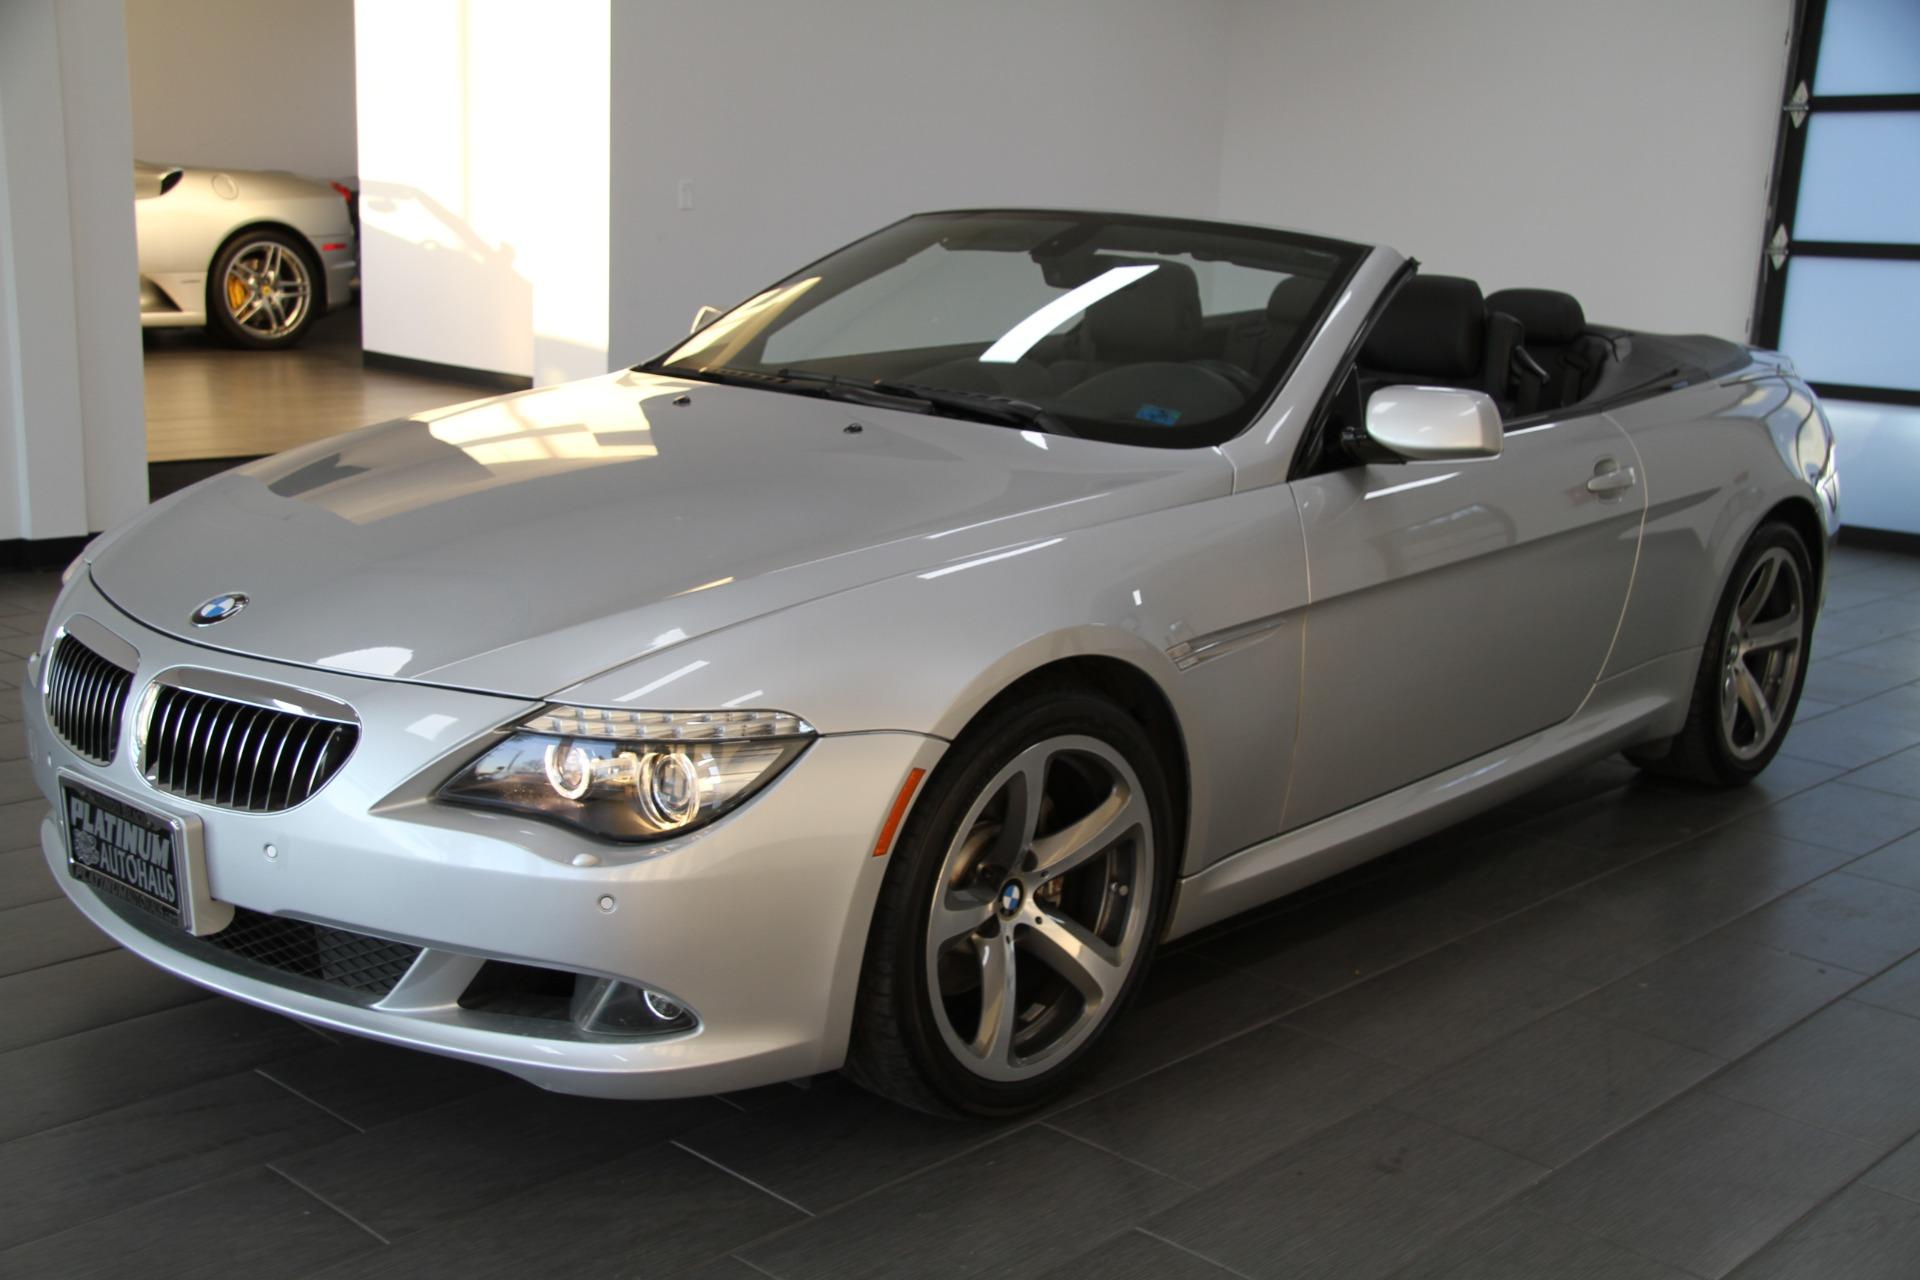 Bmw Dealership Near Me >> 2008 BMW 6 Series 650i Stock # 6059B for sale near Redondo Beach, CA | CA BMW Dealer